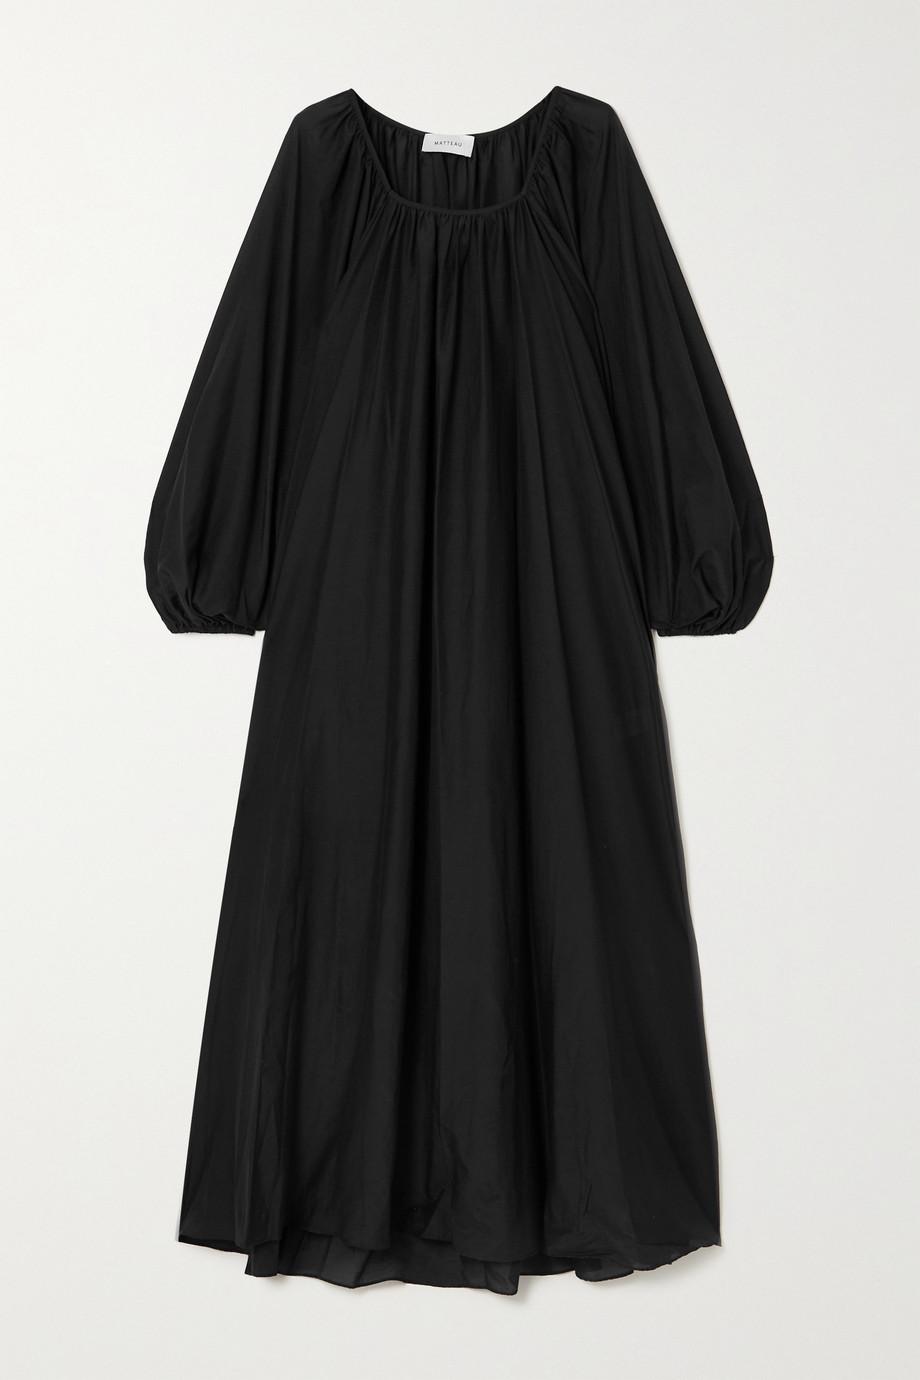 Matteau + NET SUSTAIN Decolette oversized organic cotton and silk-blend maxi dress